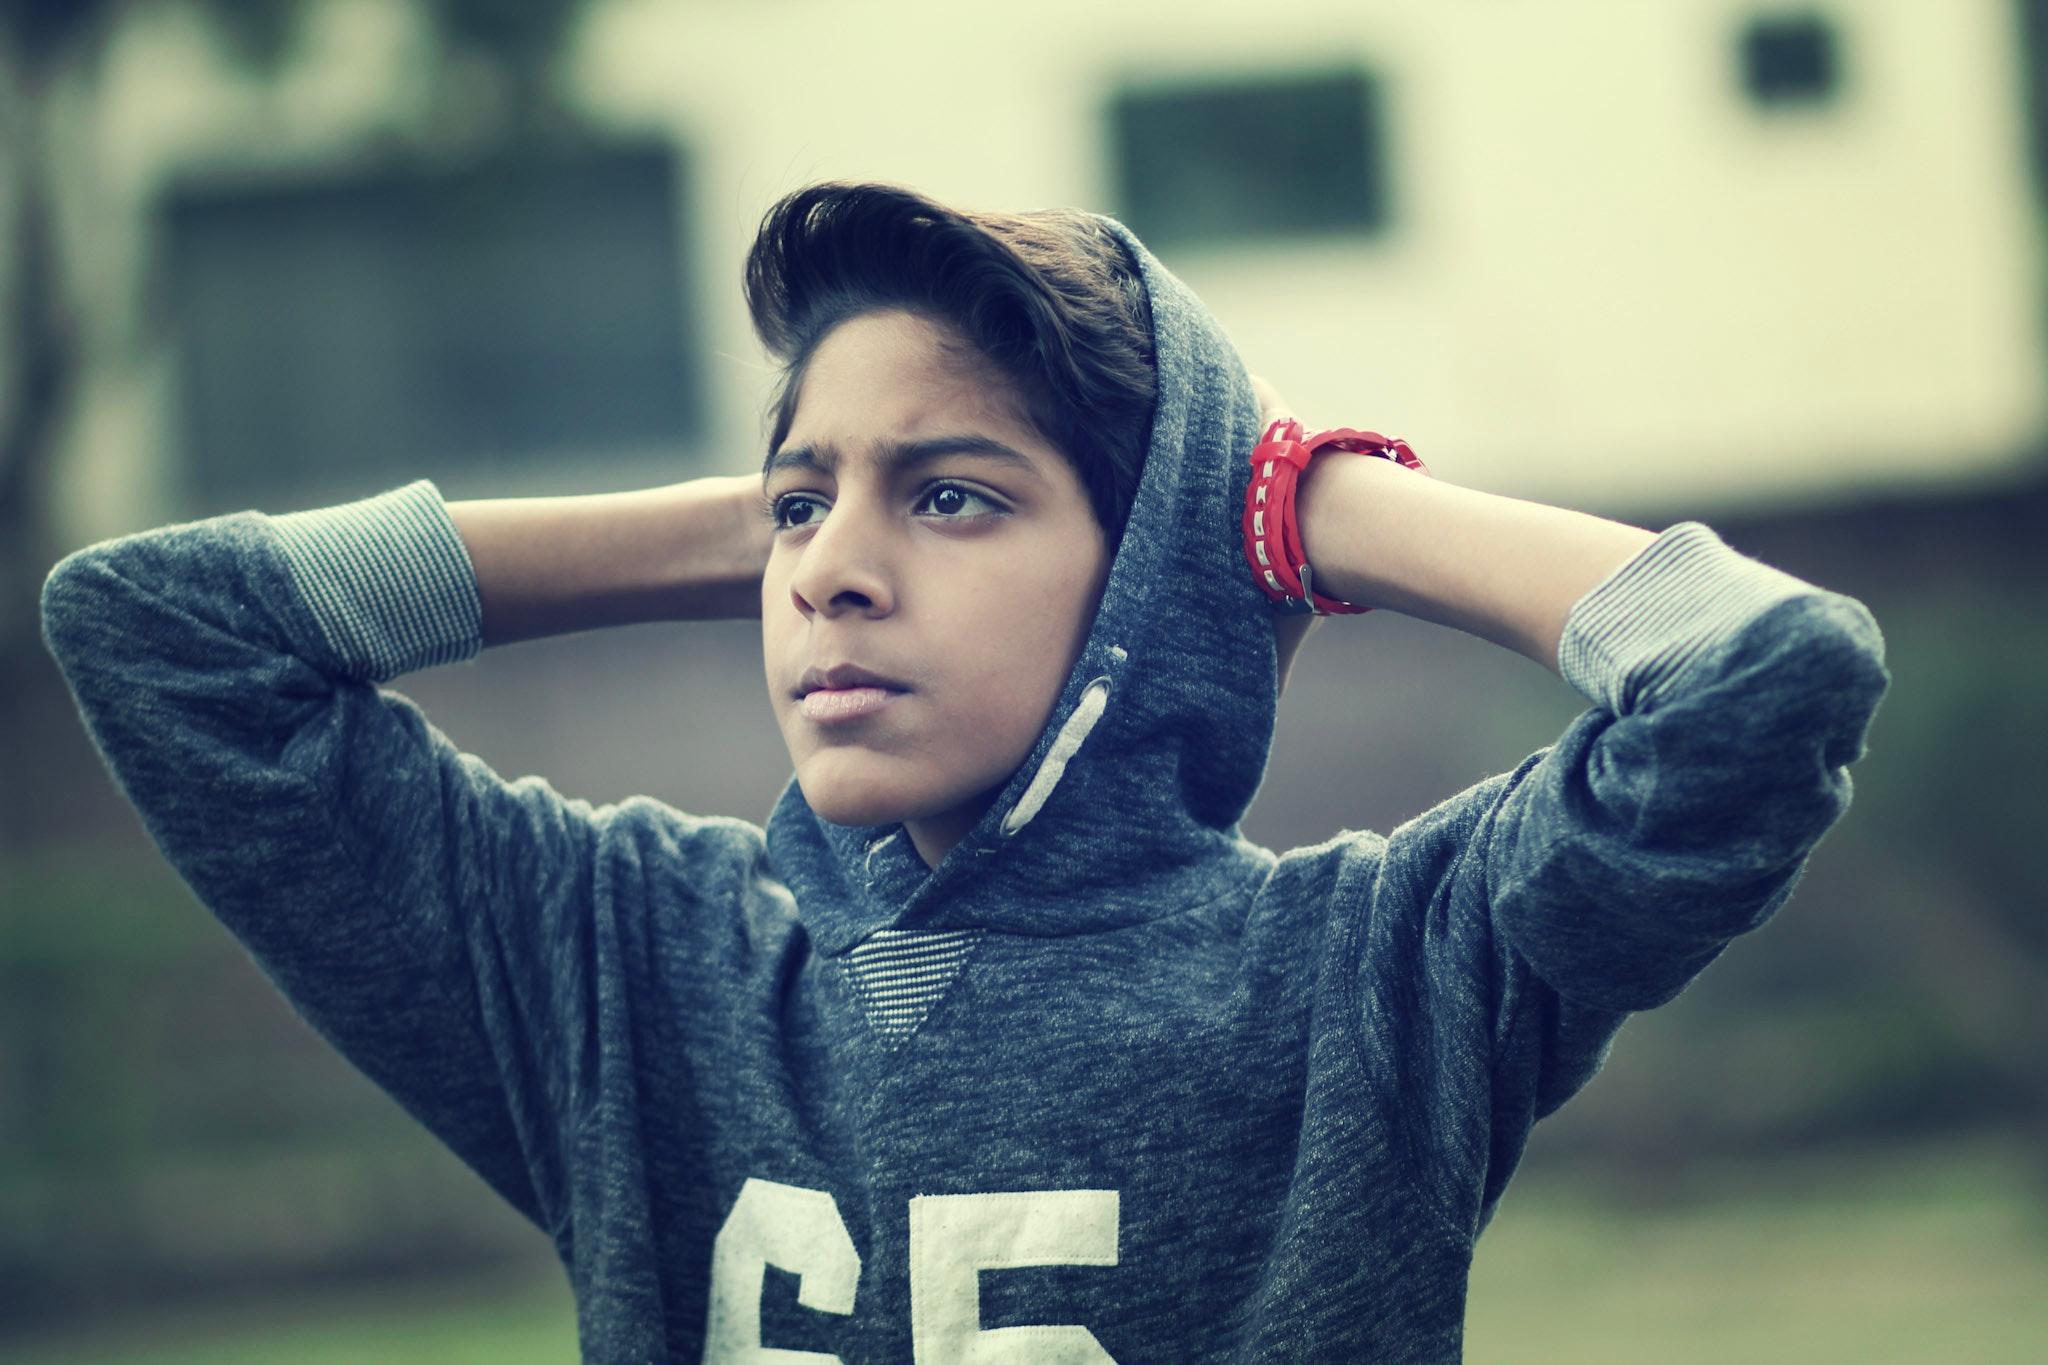 Un adolescent en sweet à capuche